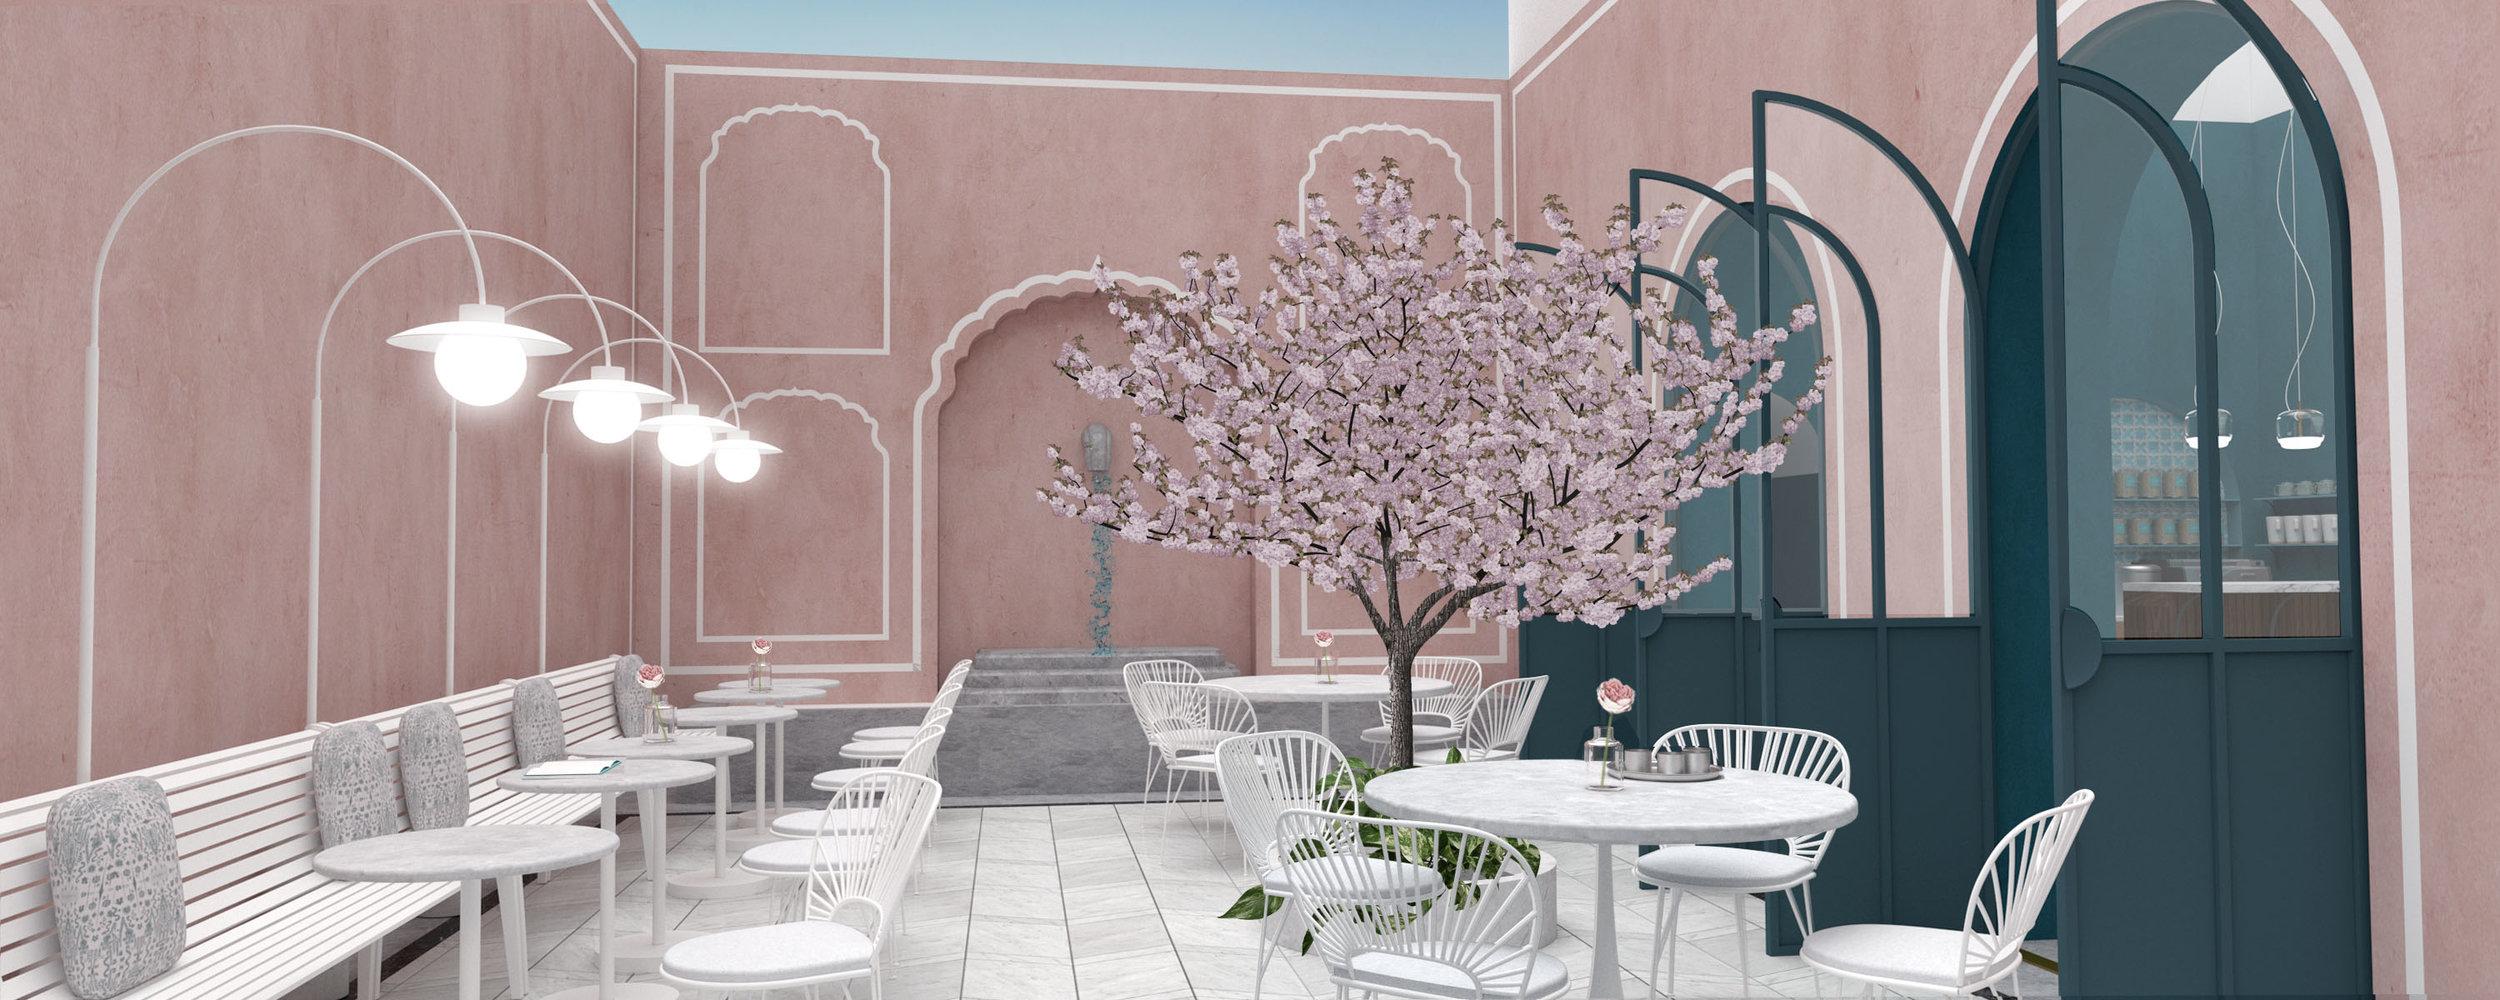 lunarlunar_interior_design_cafe_bakery_restaurant_pistachio_rose_outside.jpg